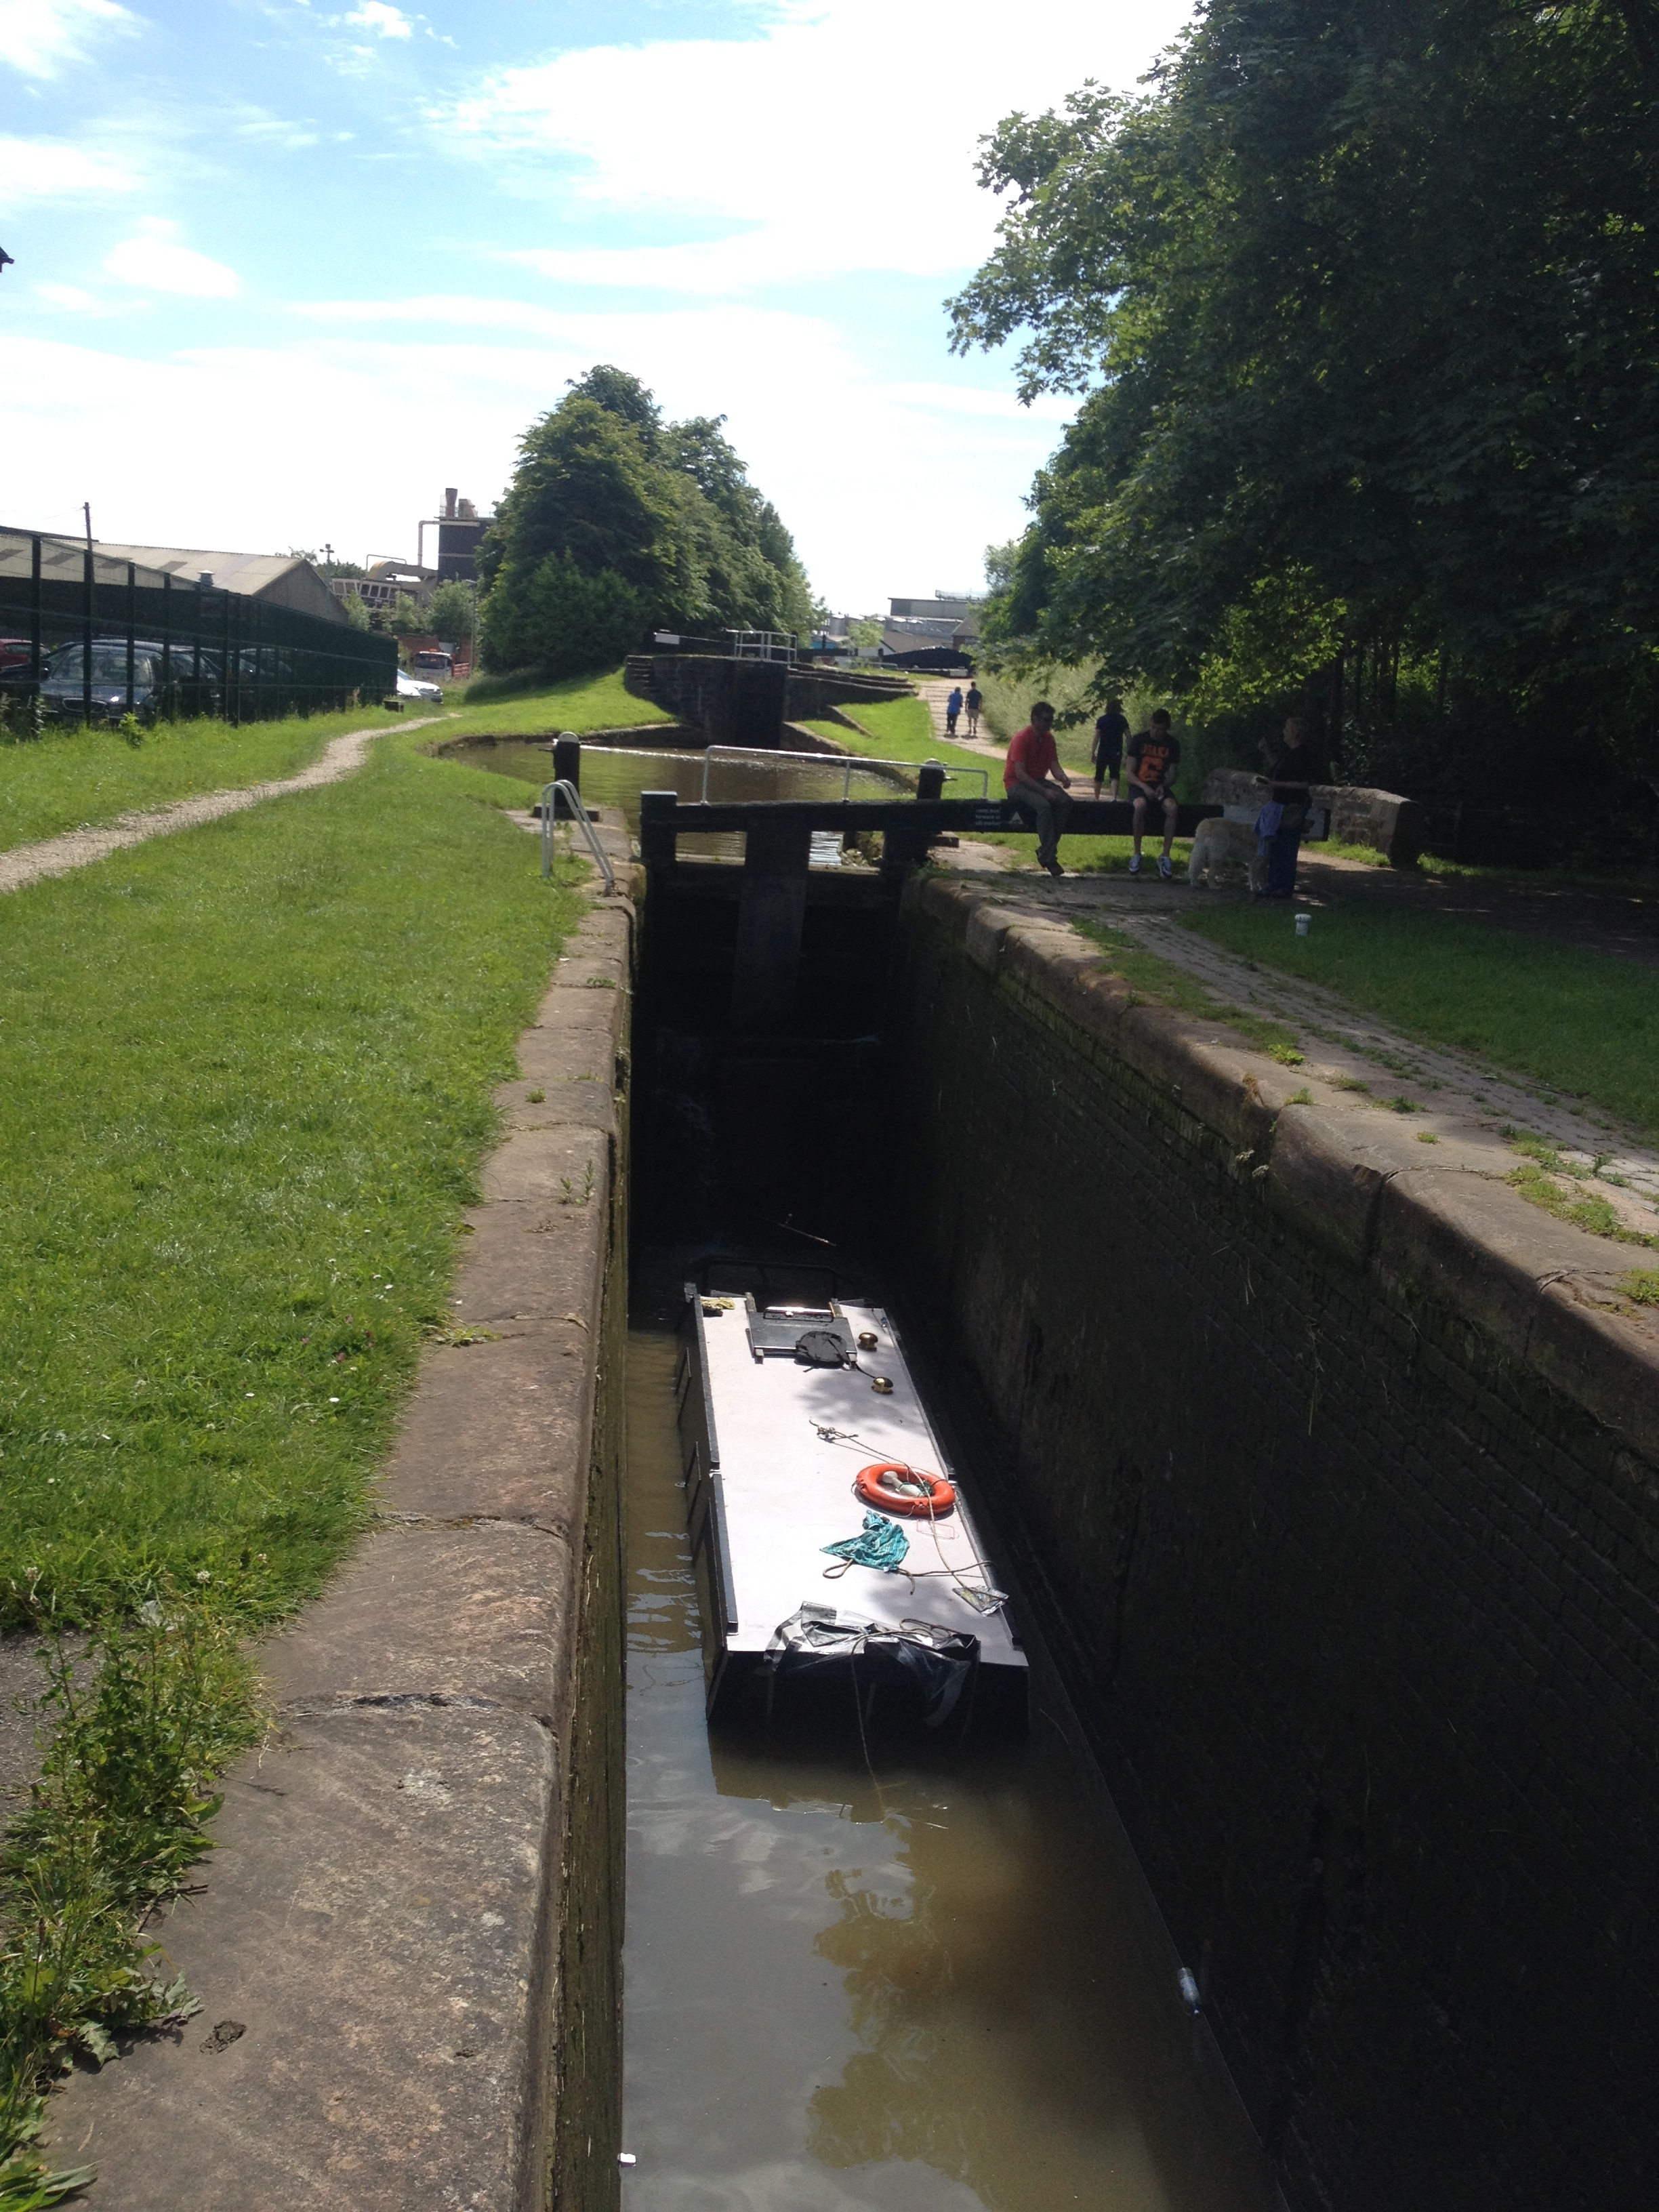 The sunken day hire boat, Lock 74